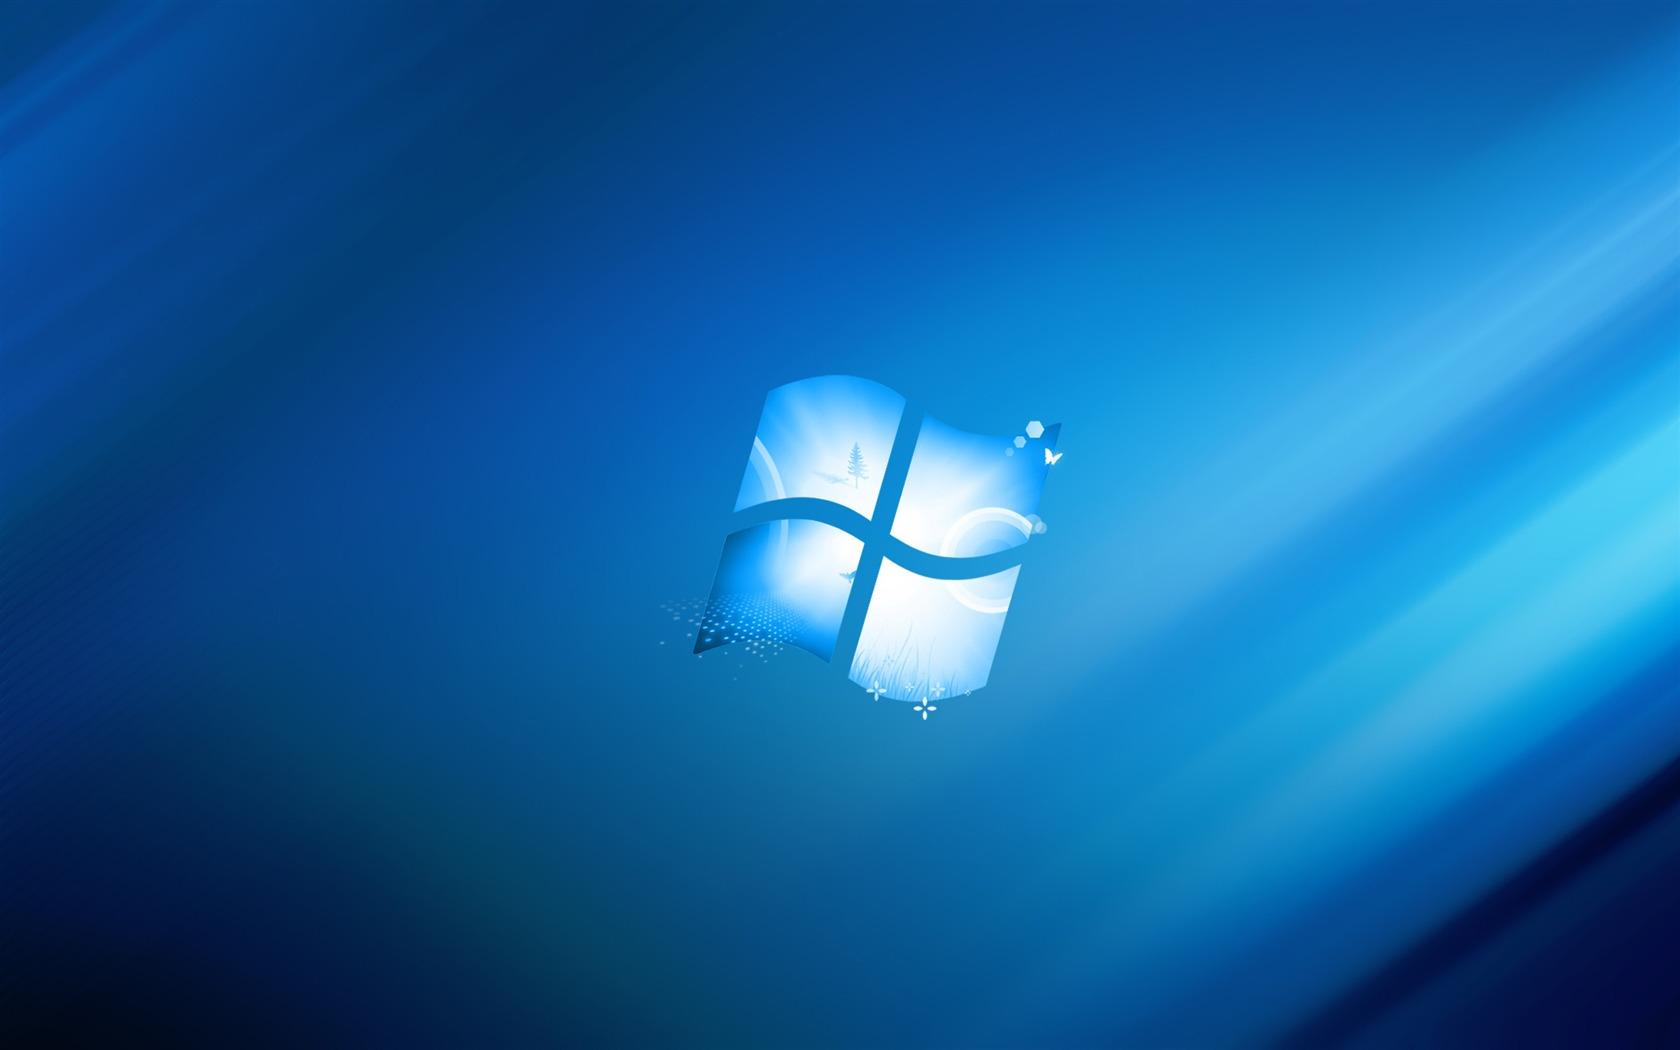 ... Windows 8 operating system desktop wallpaper 04 - 1680x1050 wallpaper